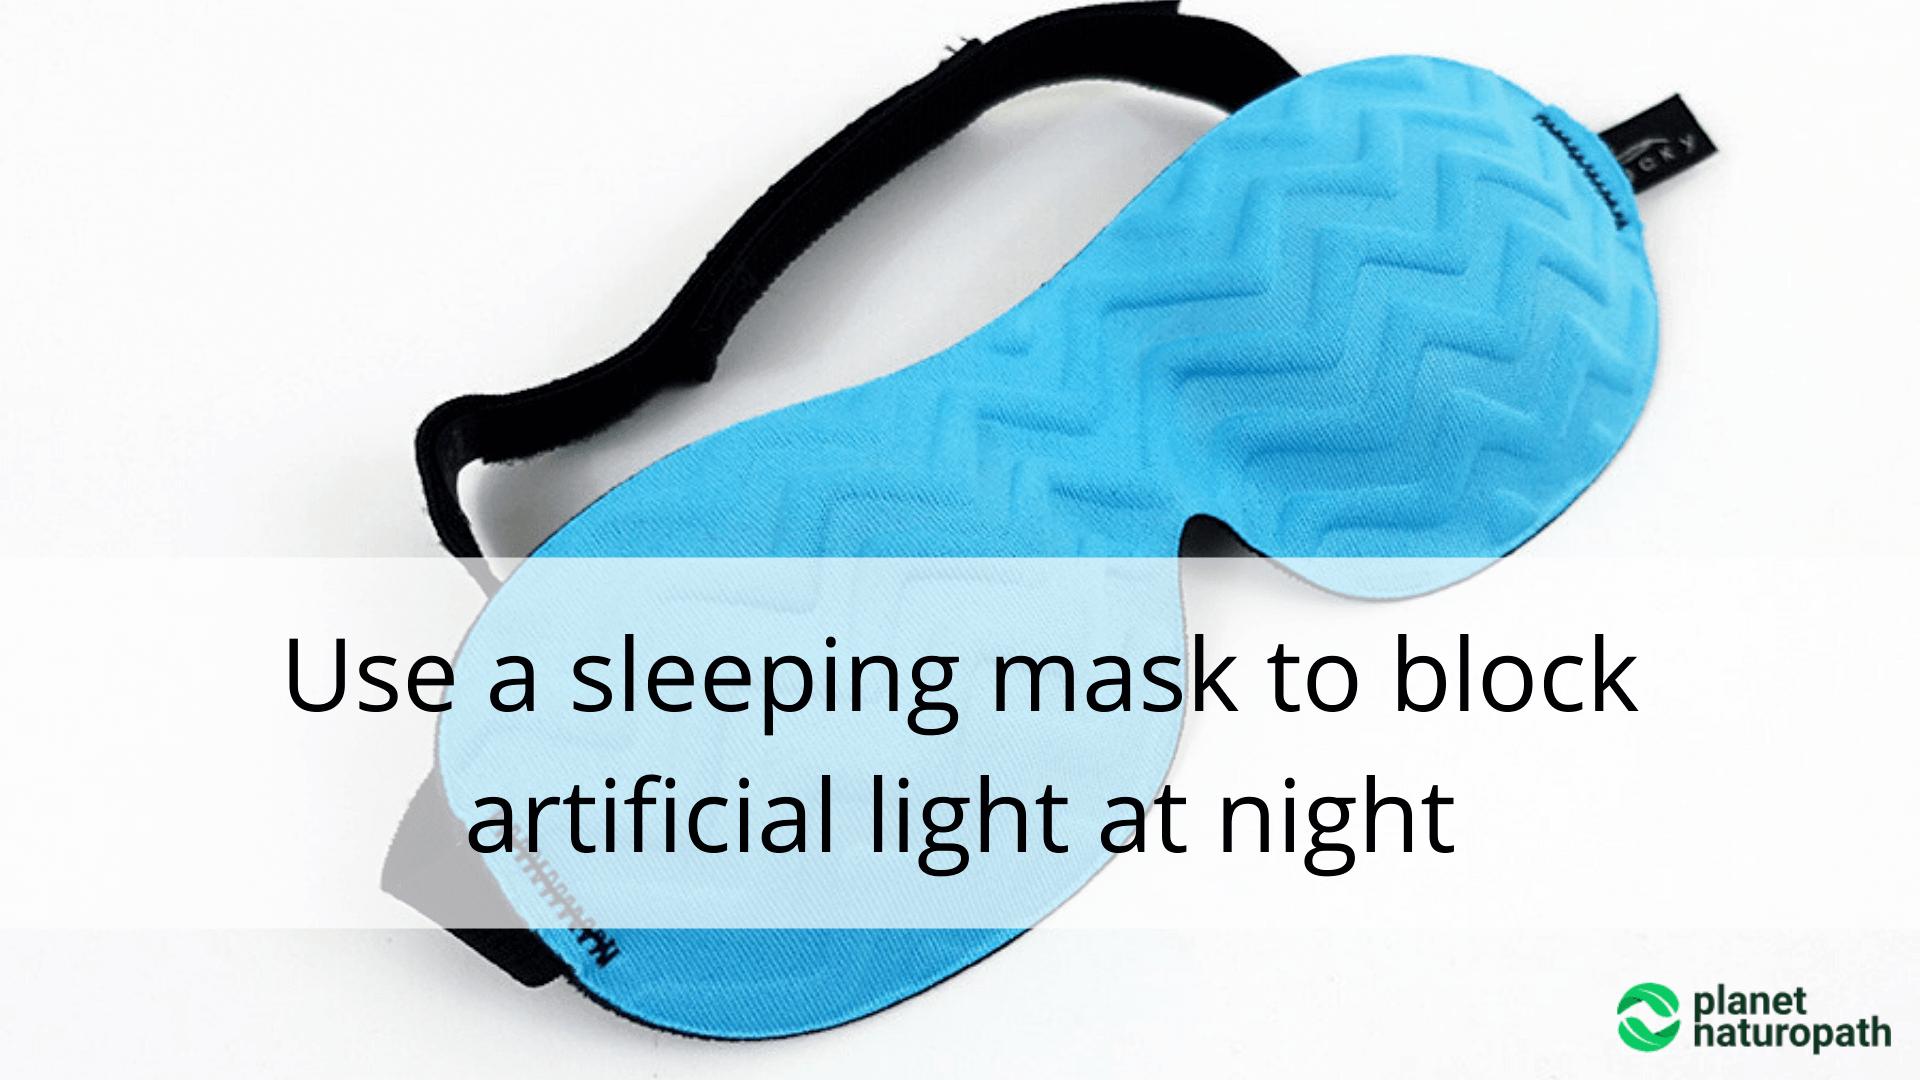 Use-a-sleeping-mask